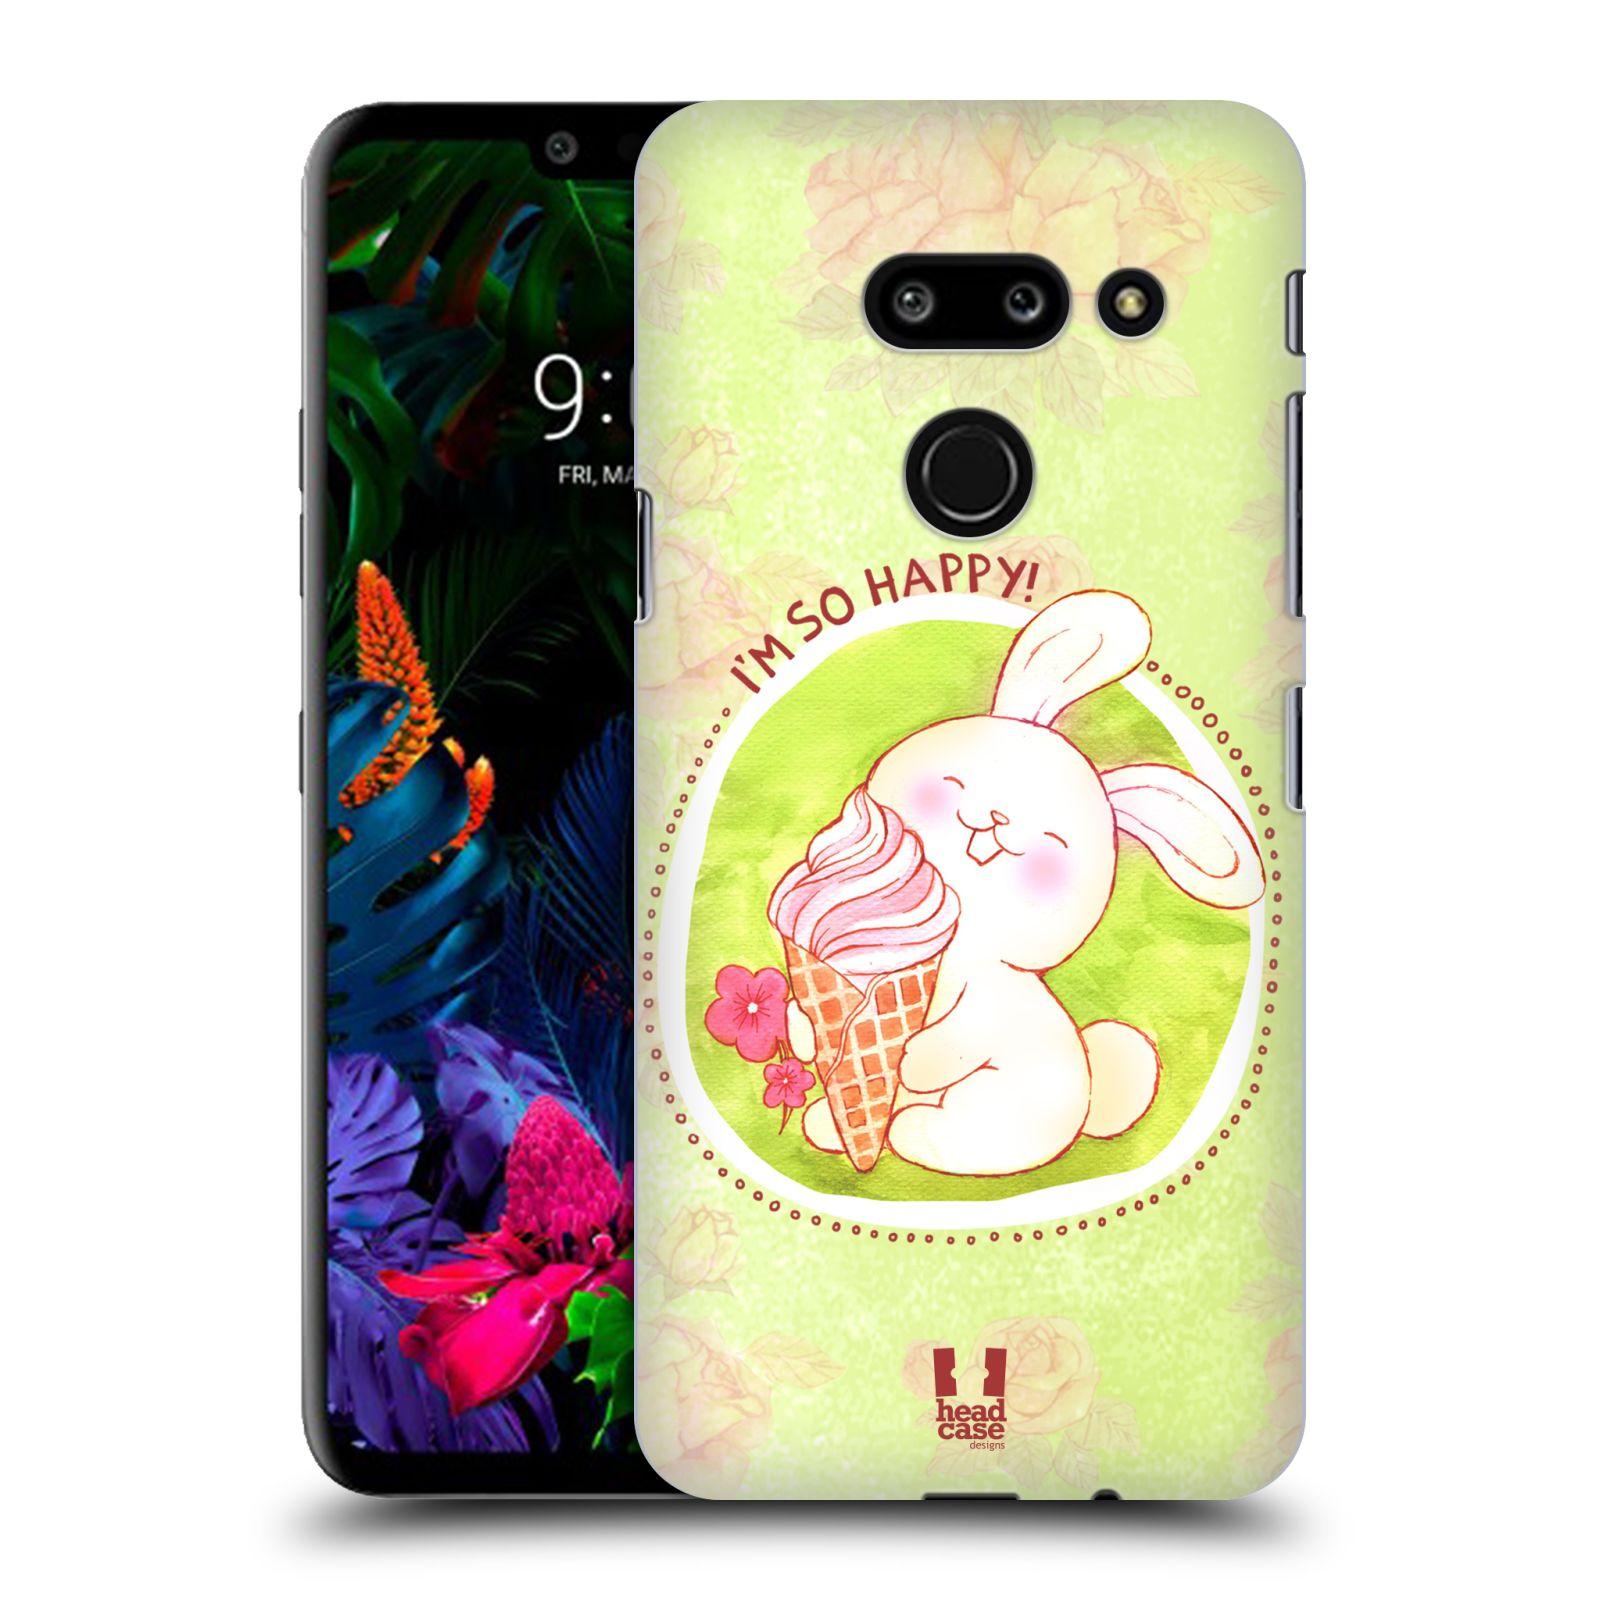 Plastové pouzdro na mobil LG G8 ThinQ - Head Case - KRÁLÍČEK A ZMRZKA